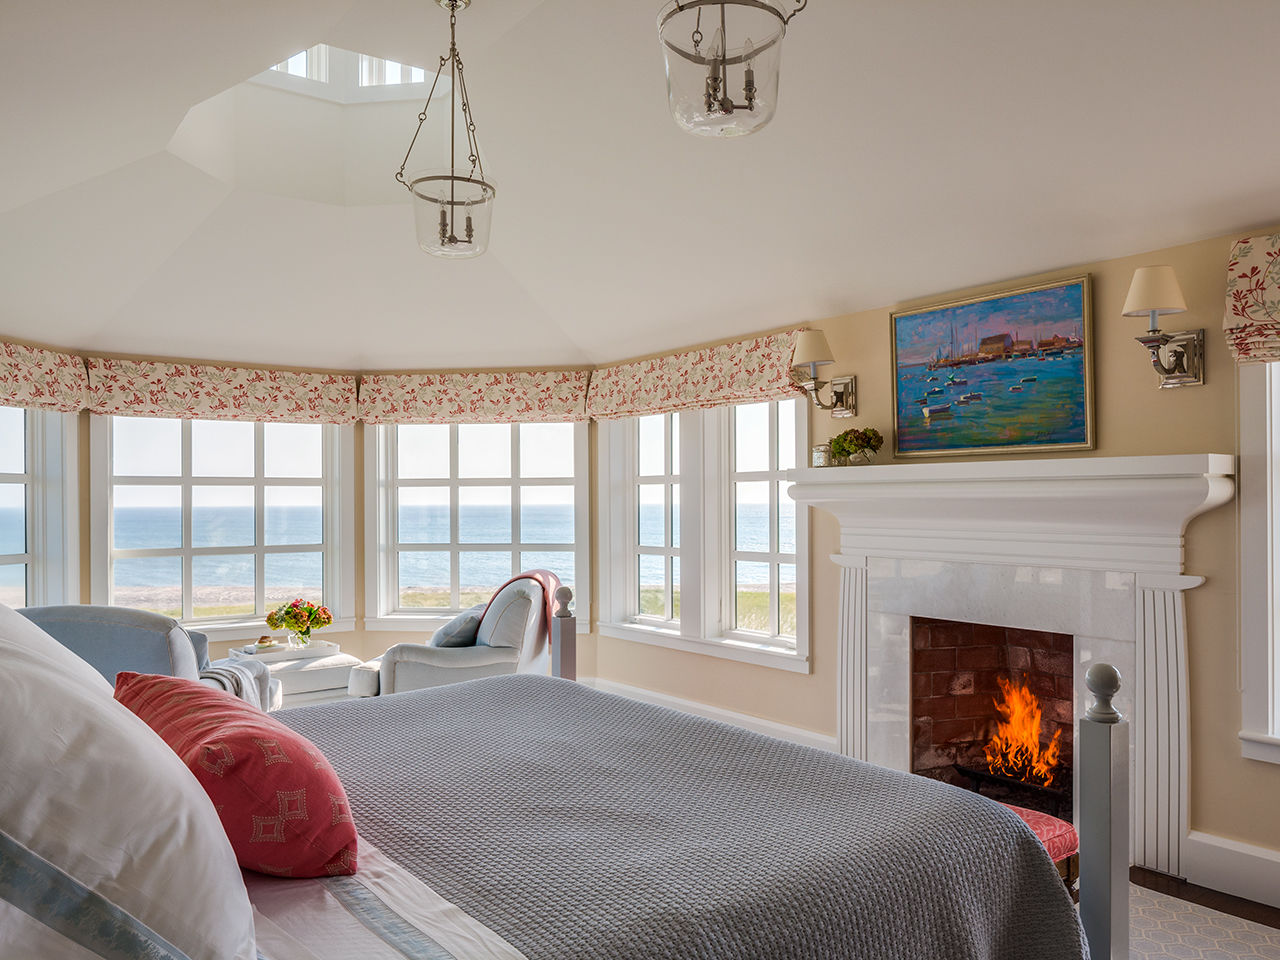 Cape Cod Beach House-A Beautiful Beach House on a Scenic Bluff in Nauset Beach 16.jpg